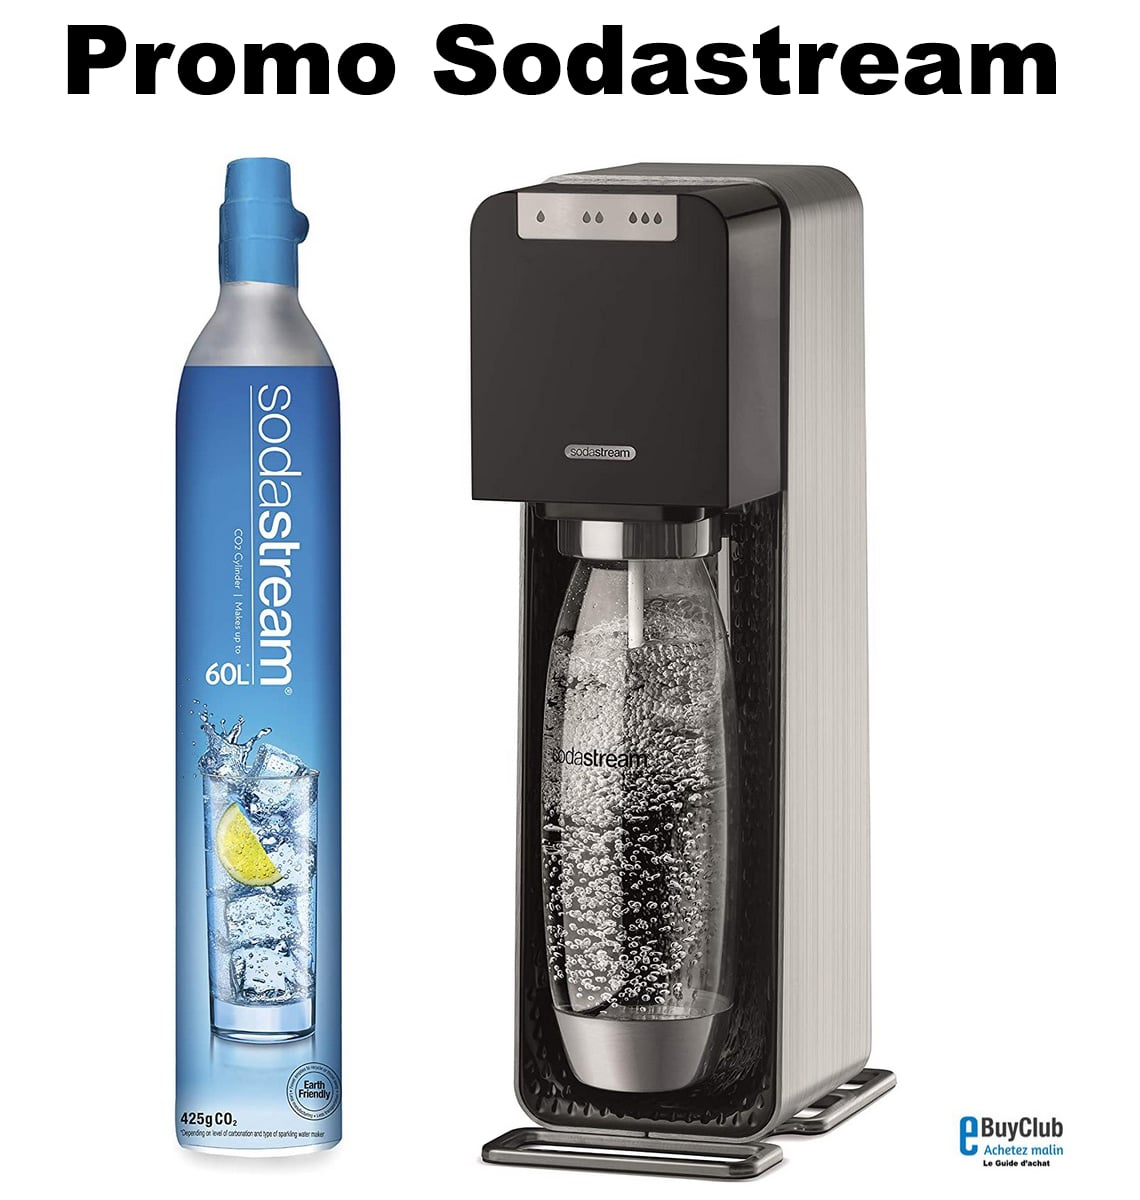 Promo Sodastream prix pas cher